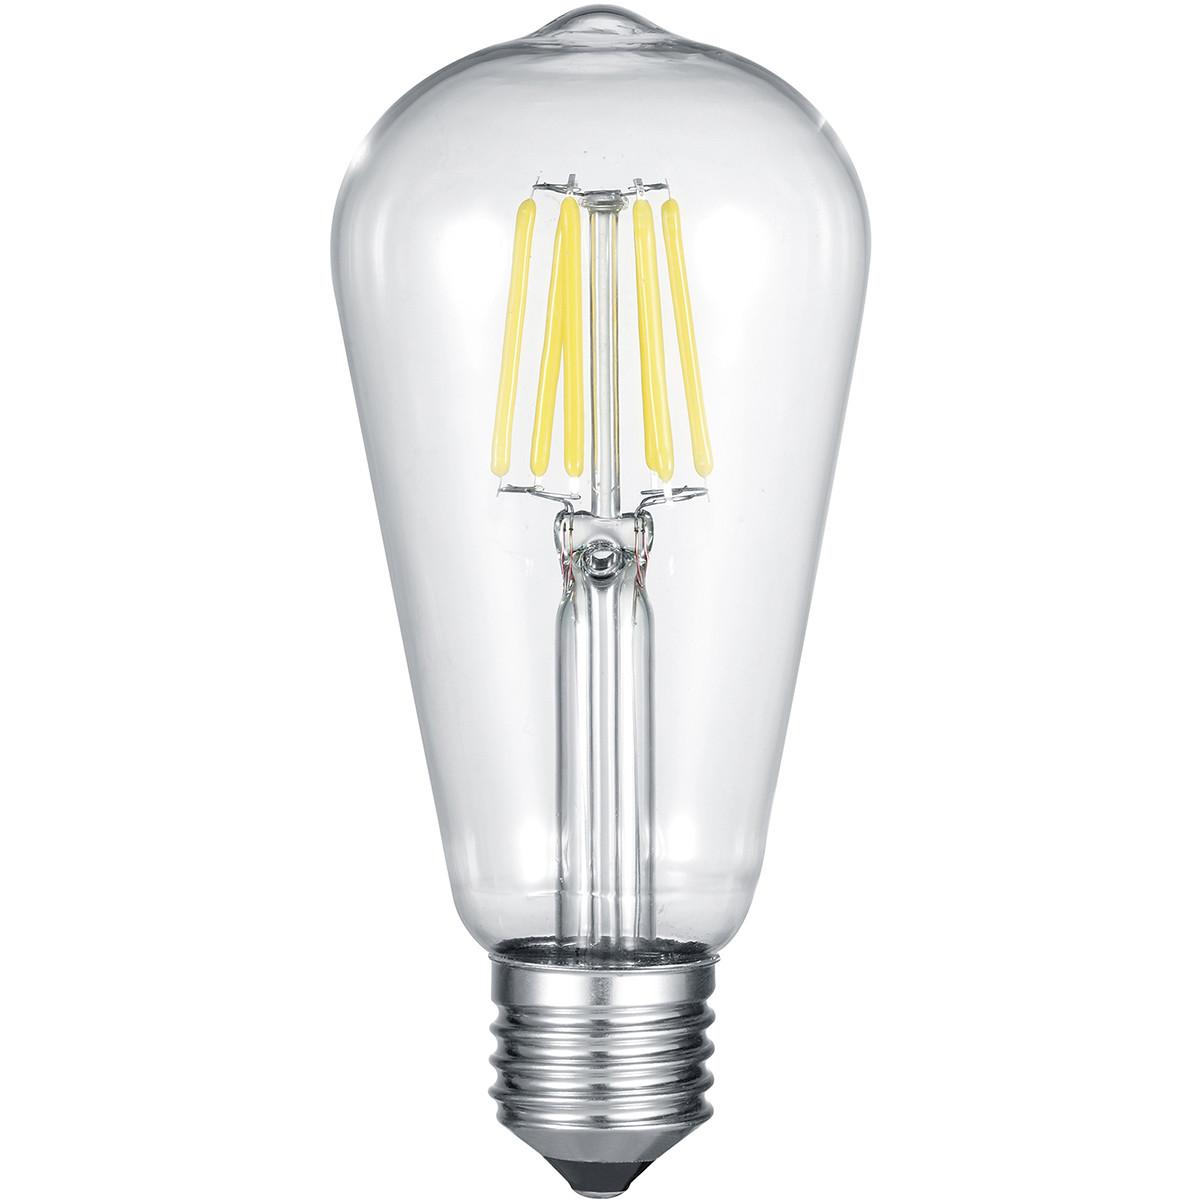 LED Lamp WiZ - Smart LED - Trion Akusti - E27 Fitting - 6W - Slimme LED - Dimbaar - Nachtlicht - Tra